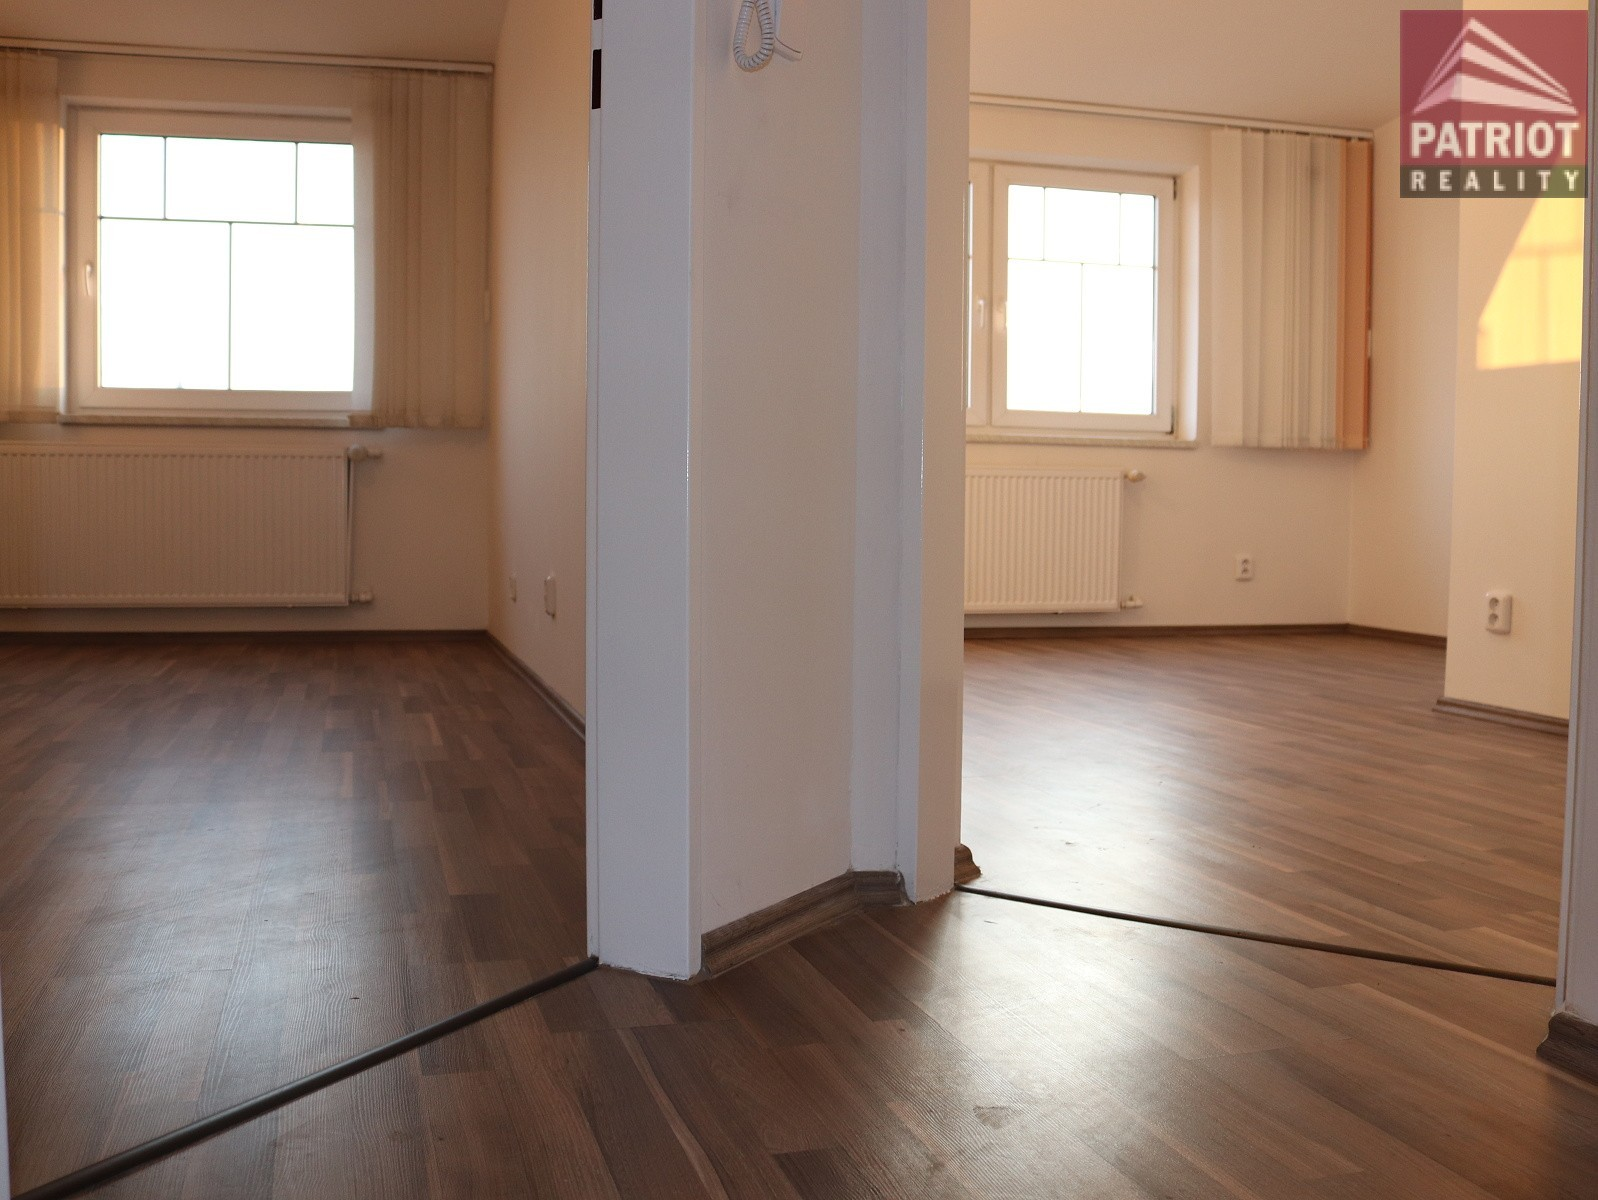 Mezonetový byt 5+1 Rejskova v Olomouci   PRODÁNO - 11